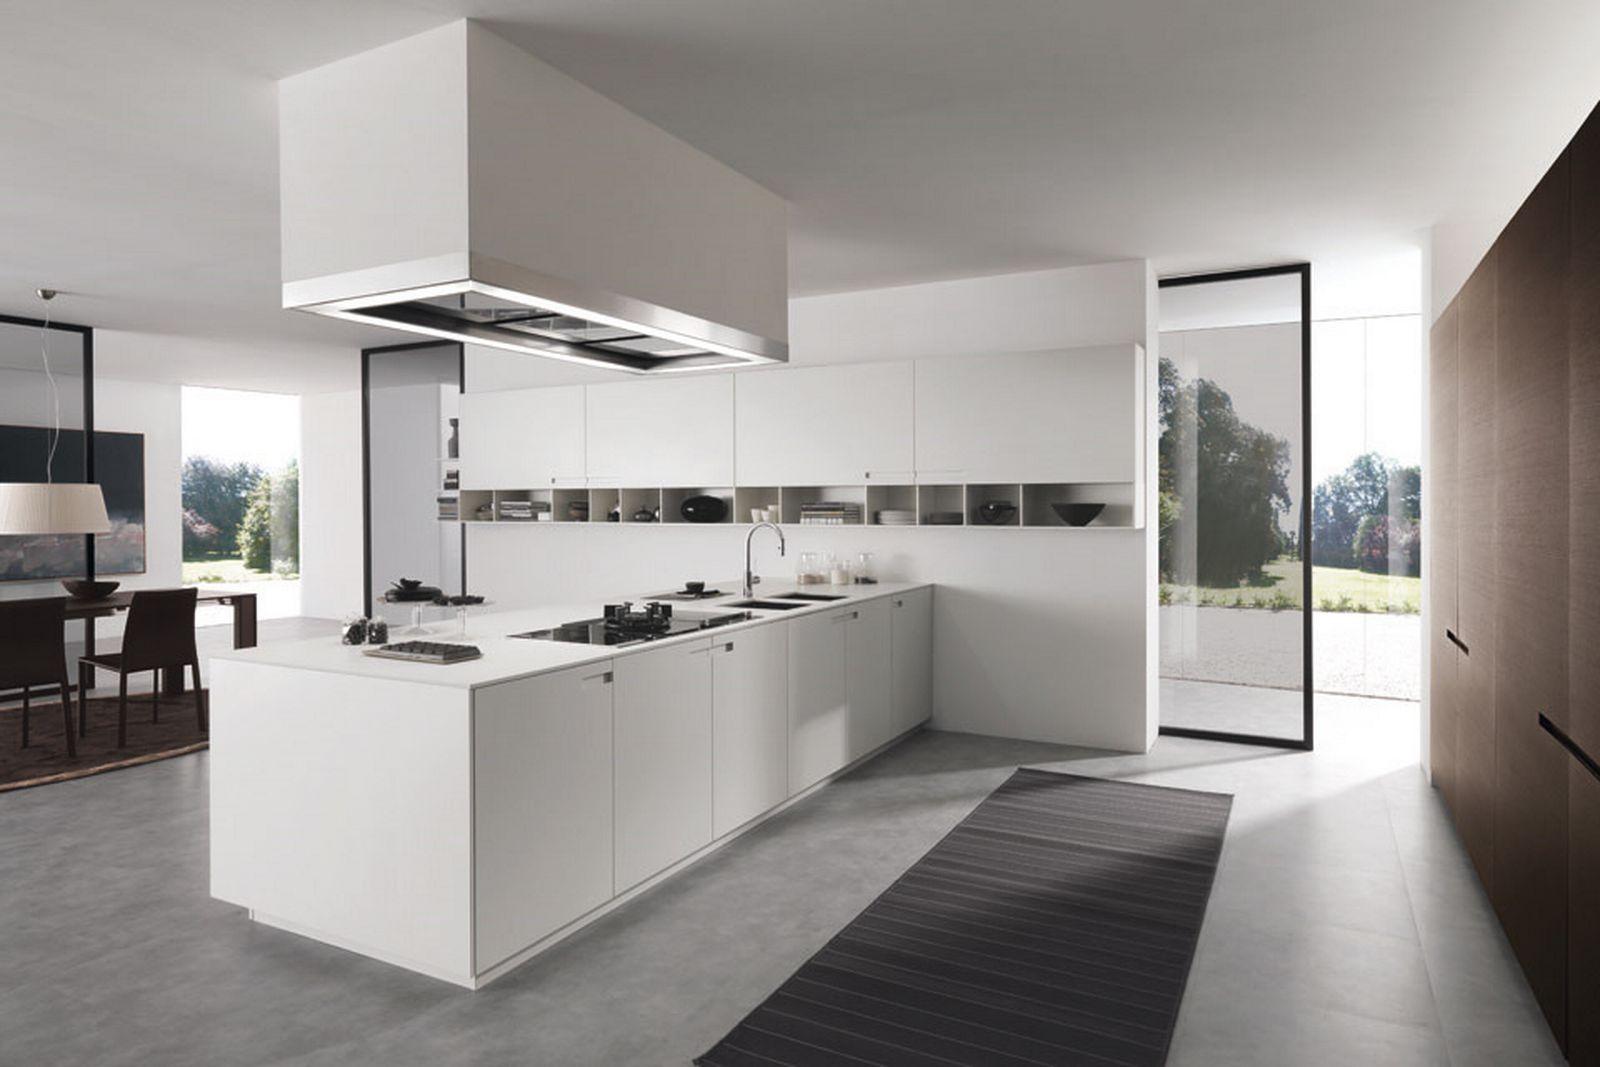 Quartet Kitchens, Fitted Kitchens Marbella Bathrooms Mijas Costa New Kitchen  Benalmadena Fuengirola Kitchens Bedrooms, Kitchens Costa Del Sol, ...